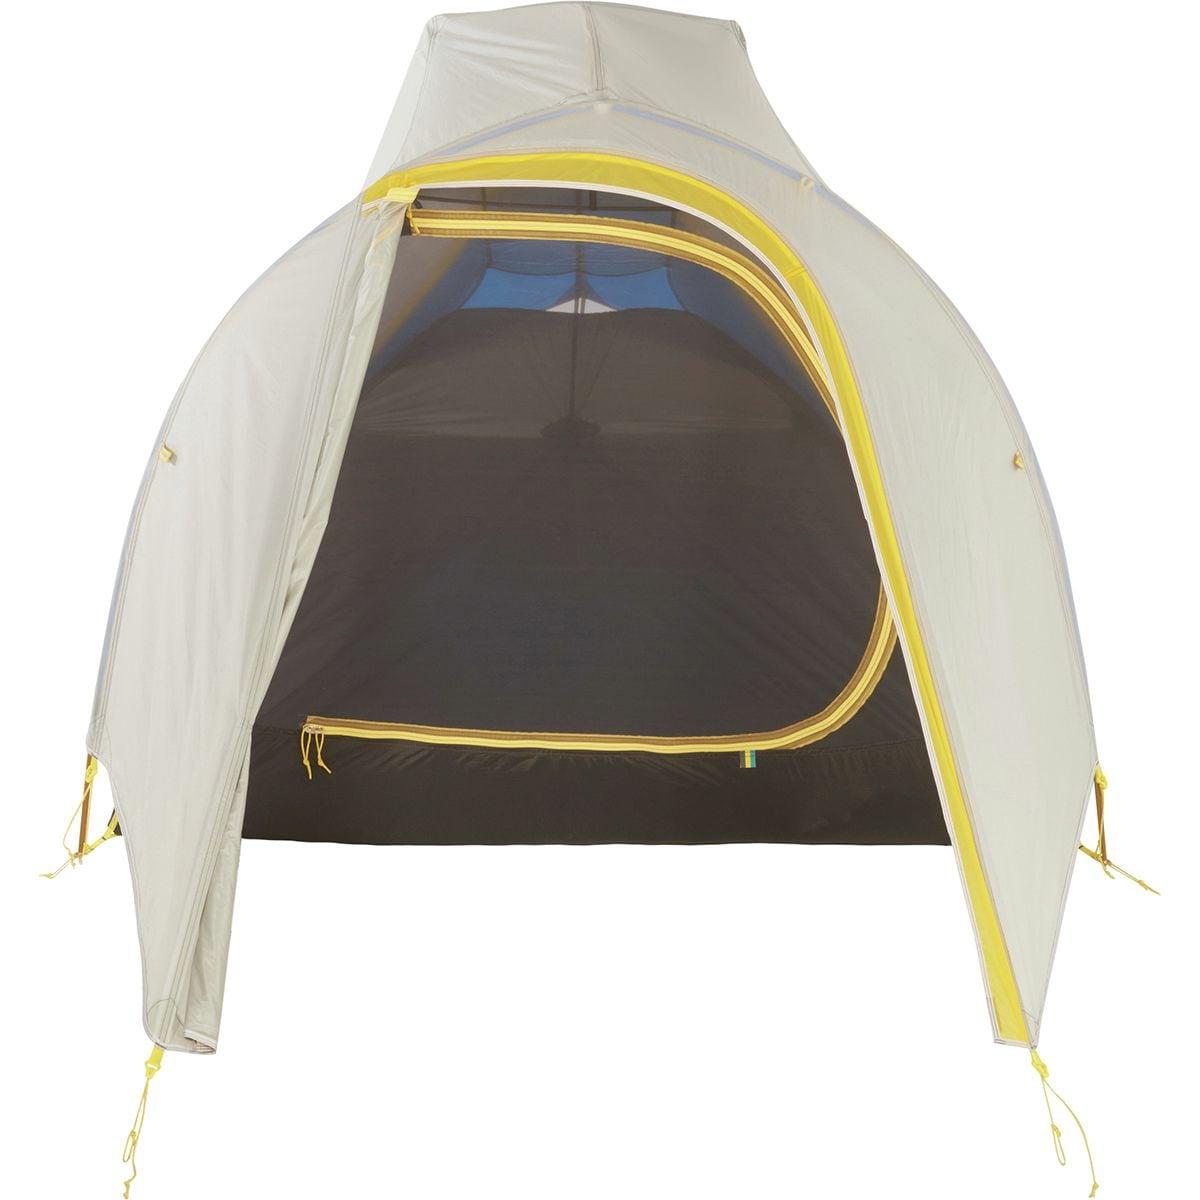 Sierra Designs Studio 2 Tent - 2-Person 3-Season